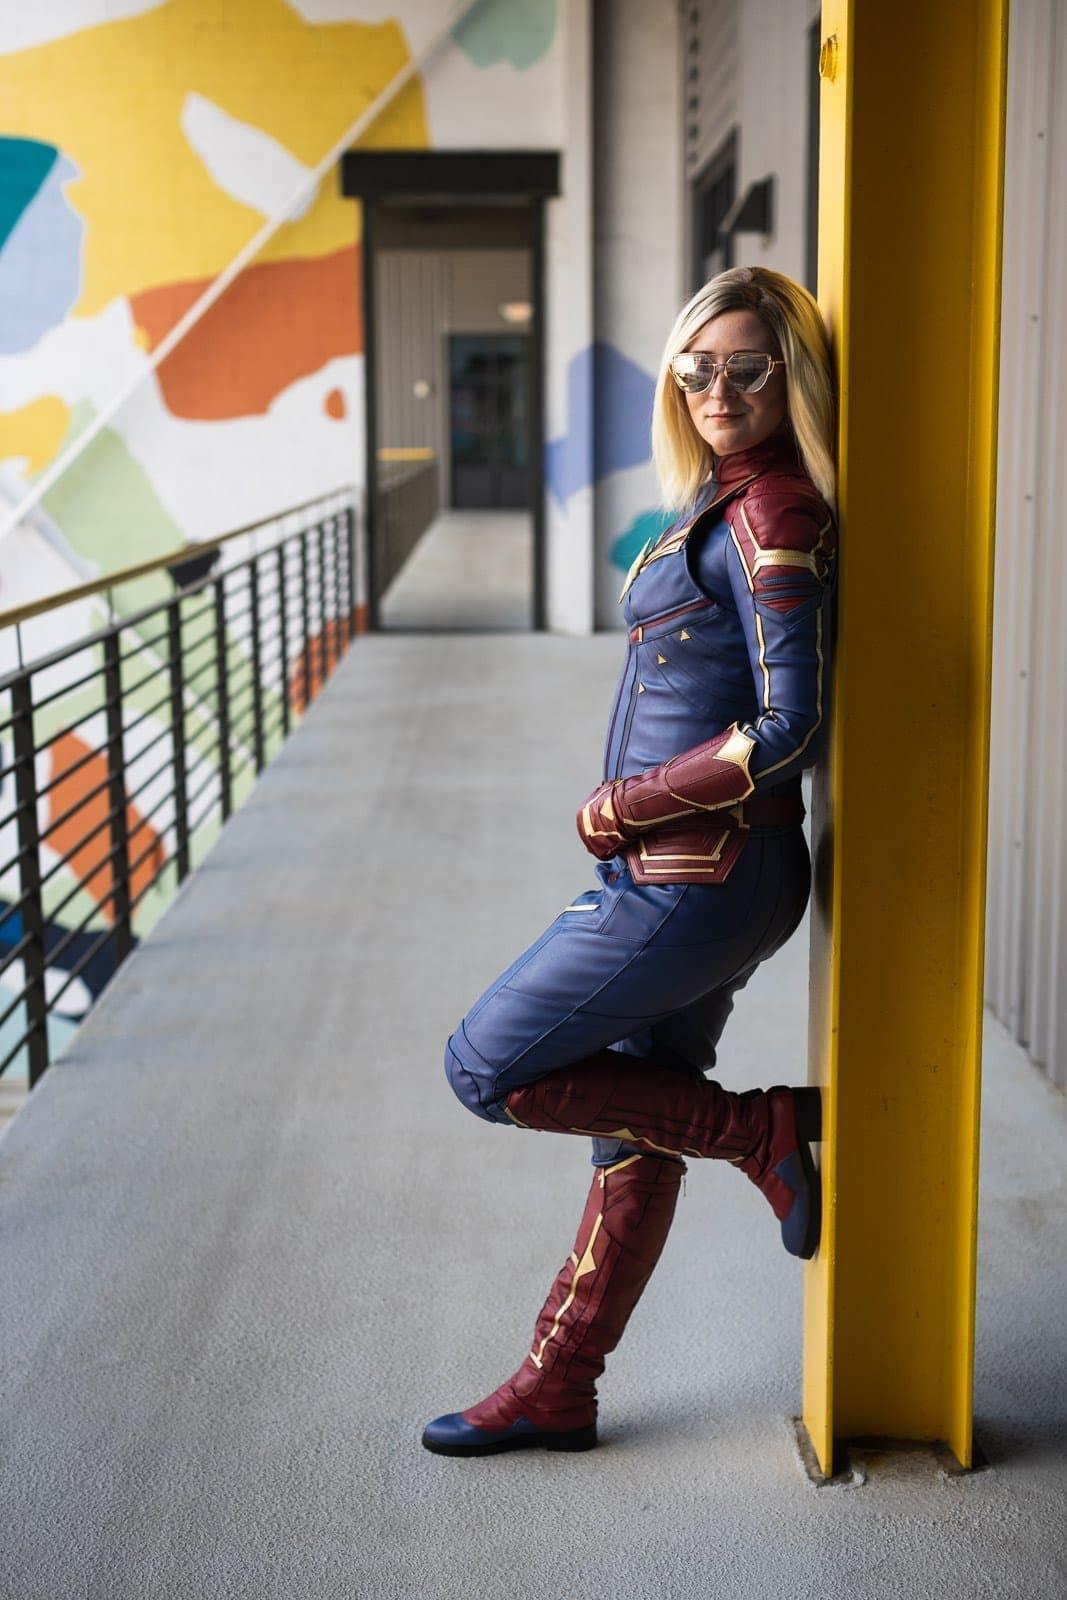 captain marvel cosplay at atlanta parking garage